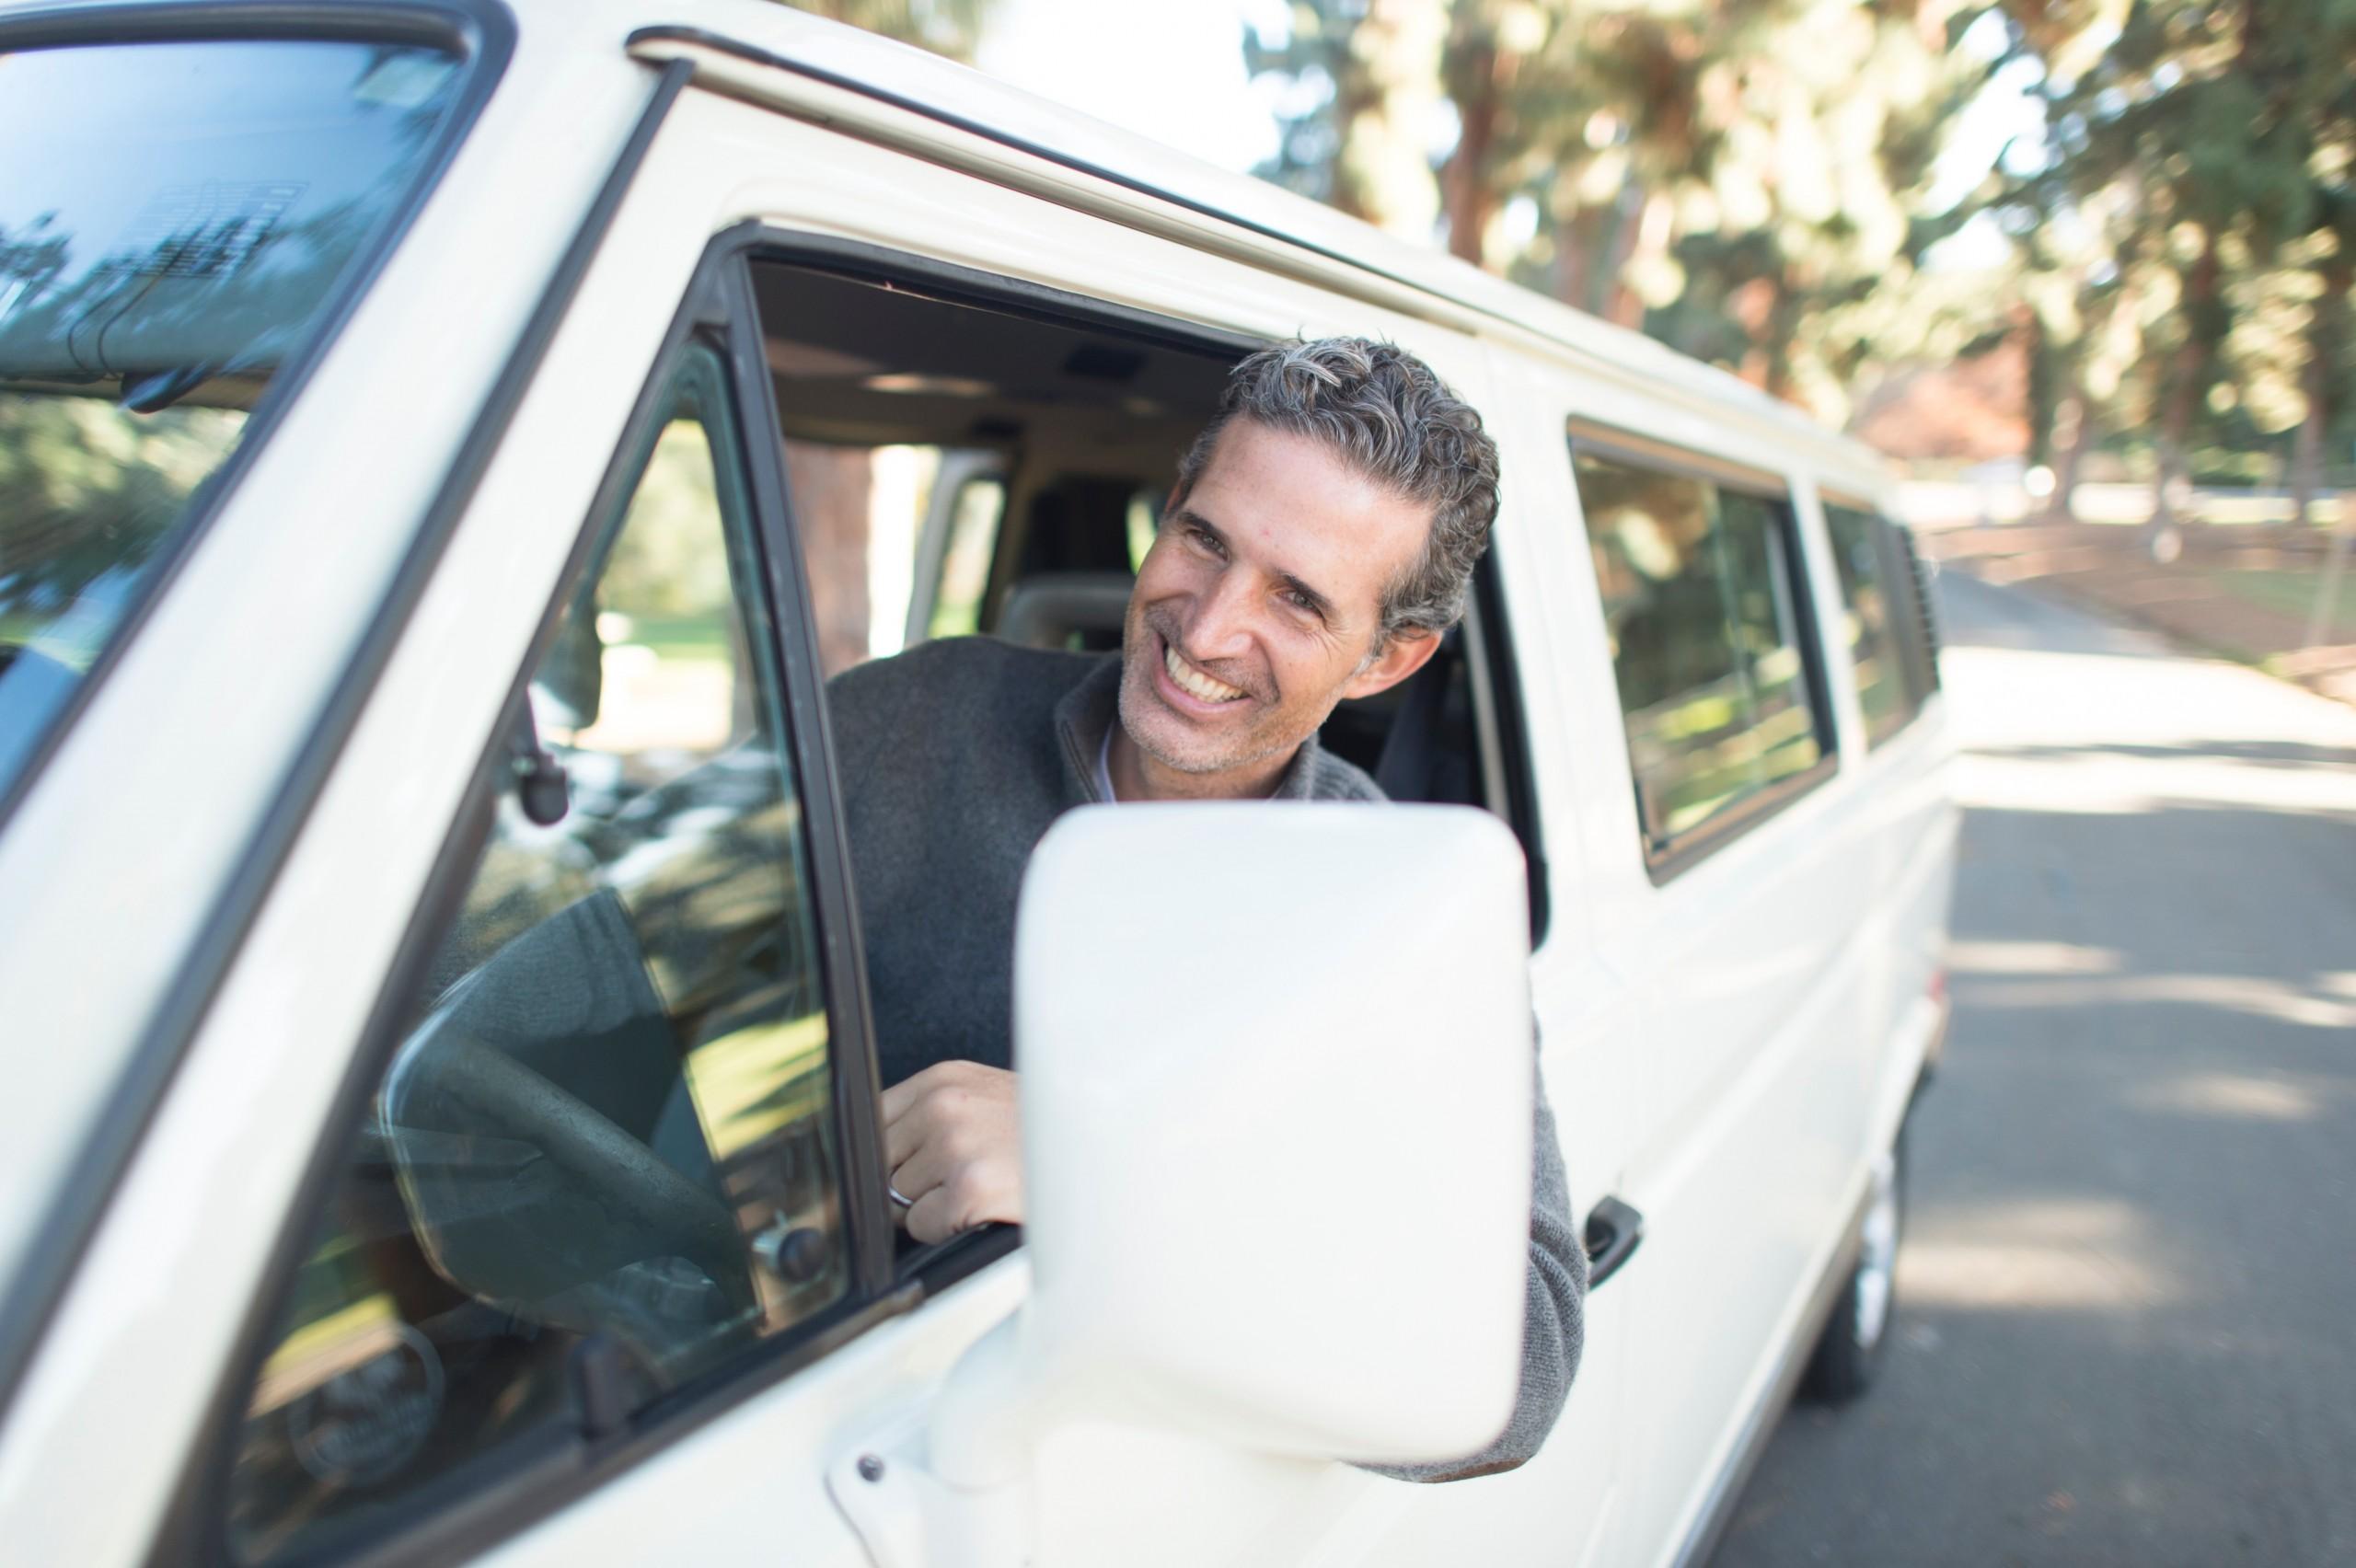 Stress-free parent who carpools